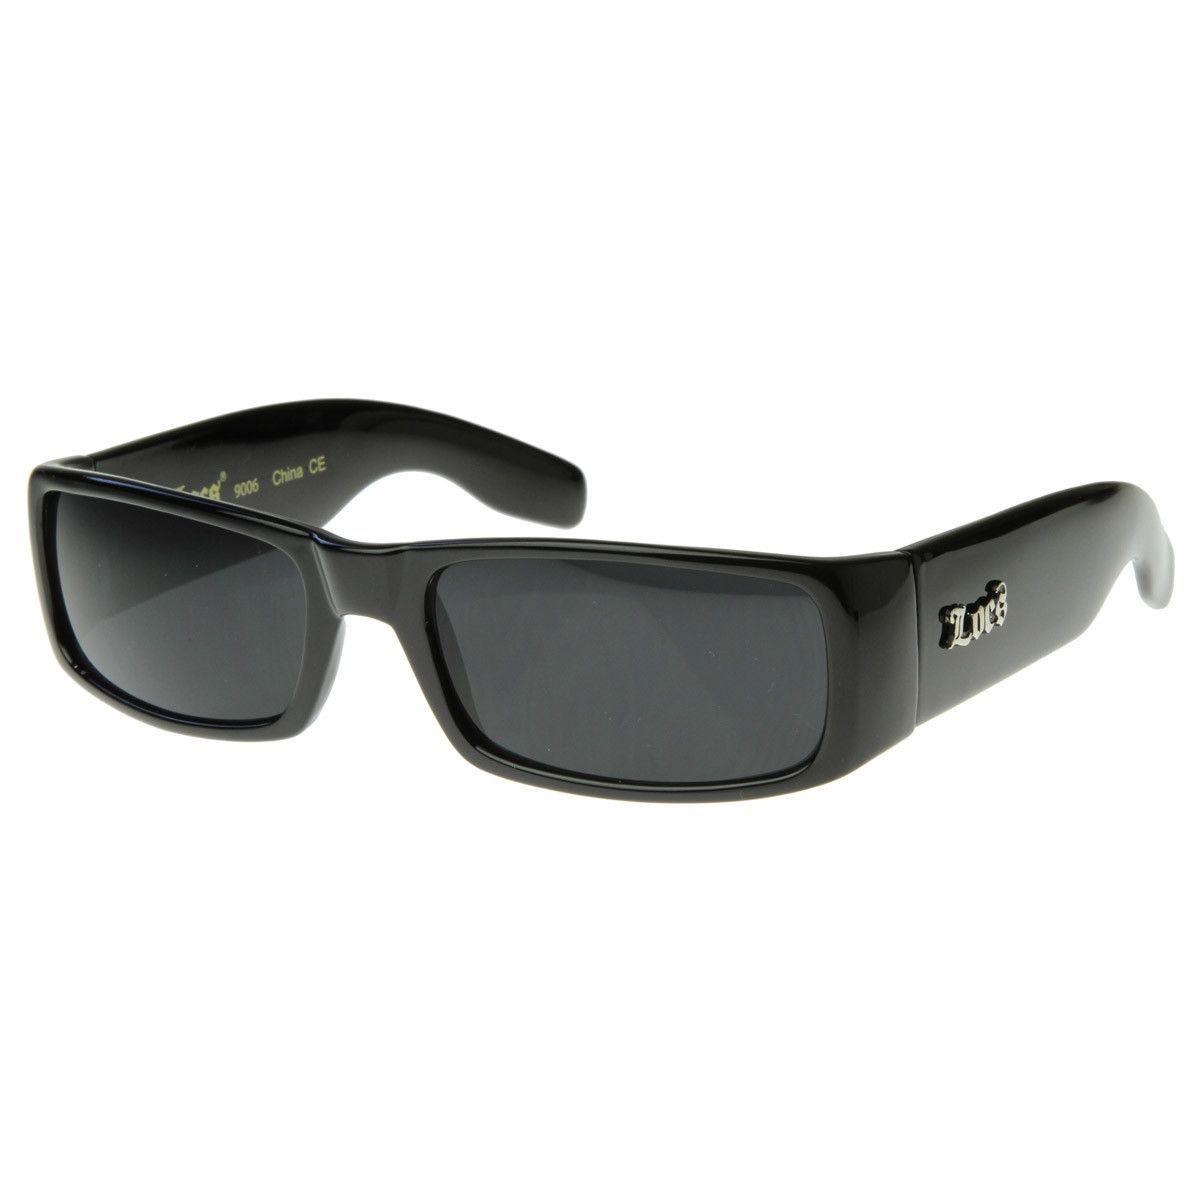 0a7f520f51bb Original Gangster Shades OG Locs Sunglasses